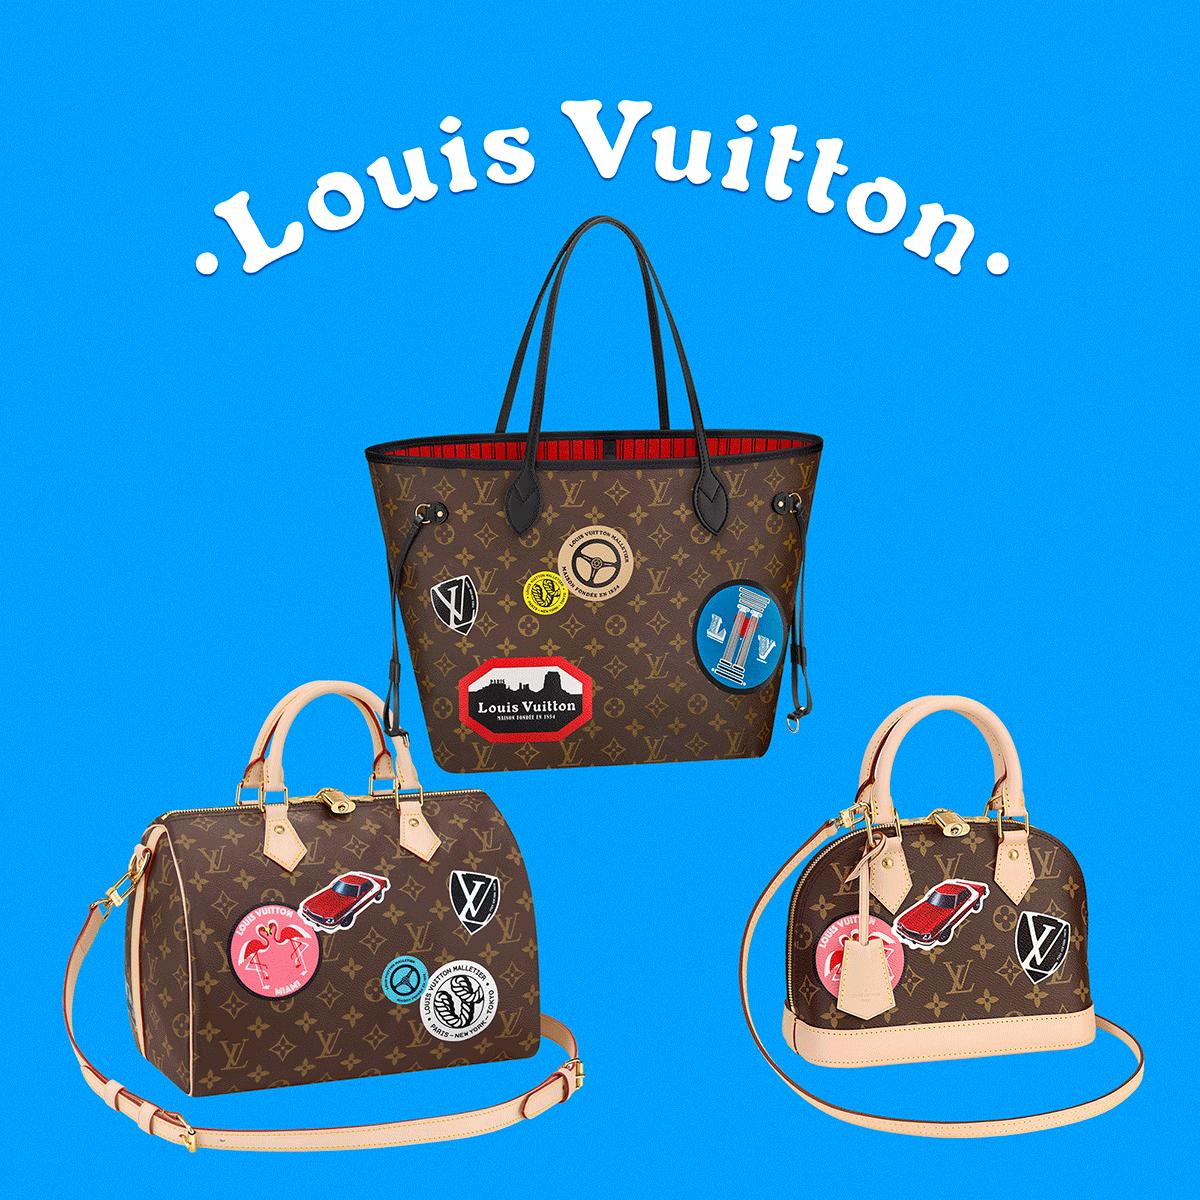 Louis Vuitton rusza w świat